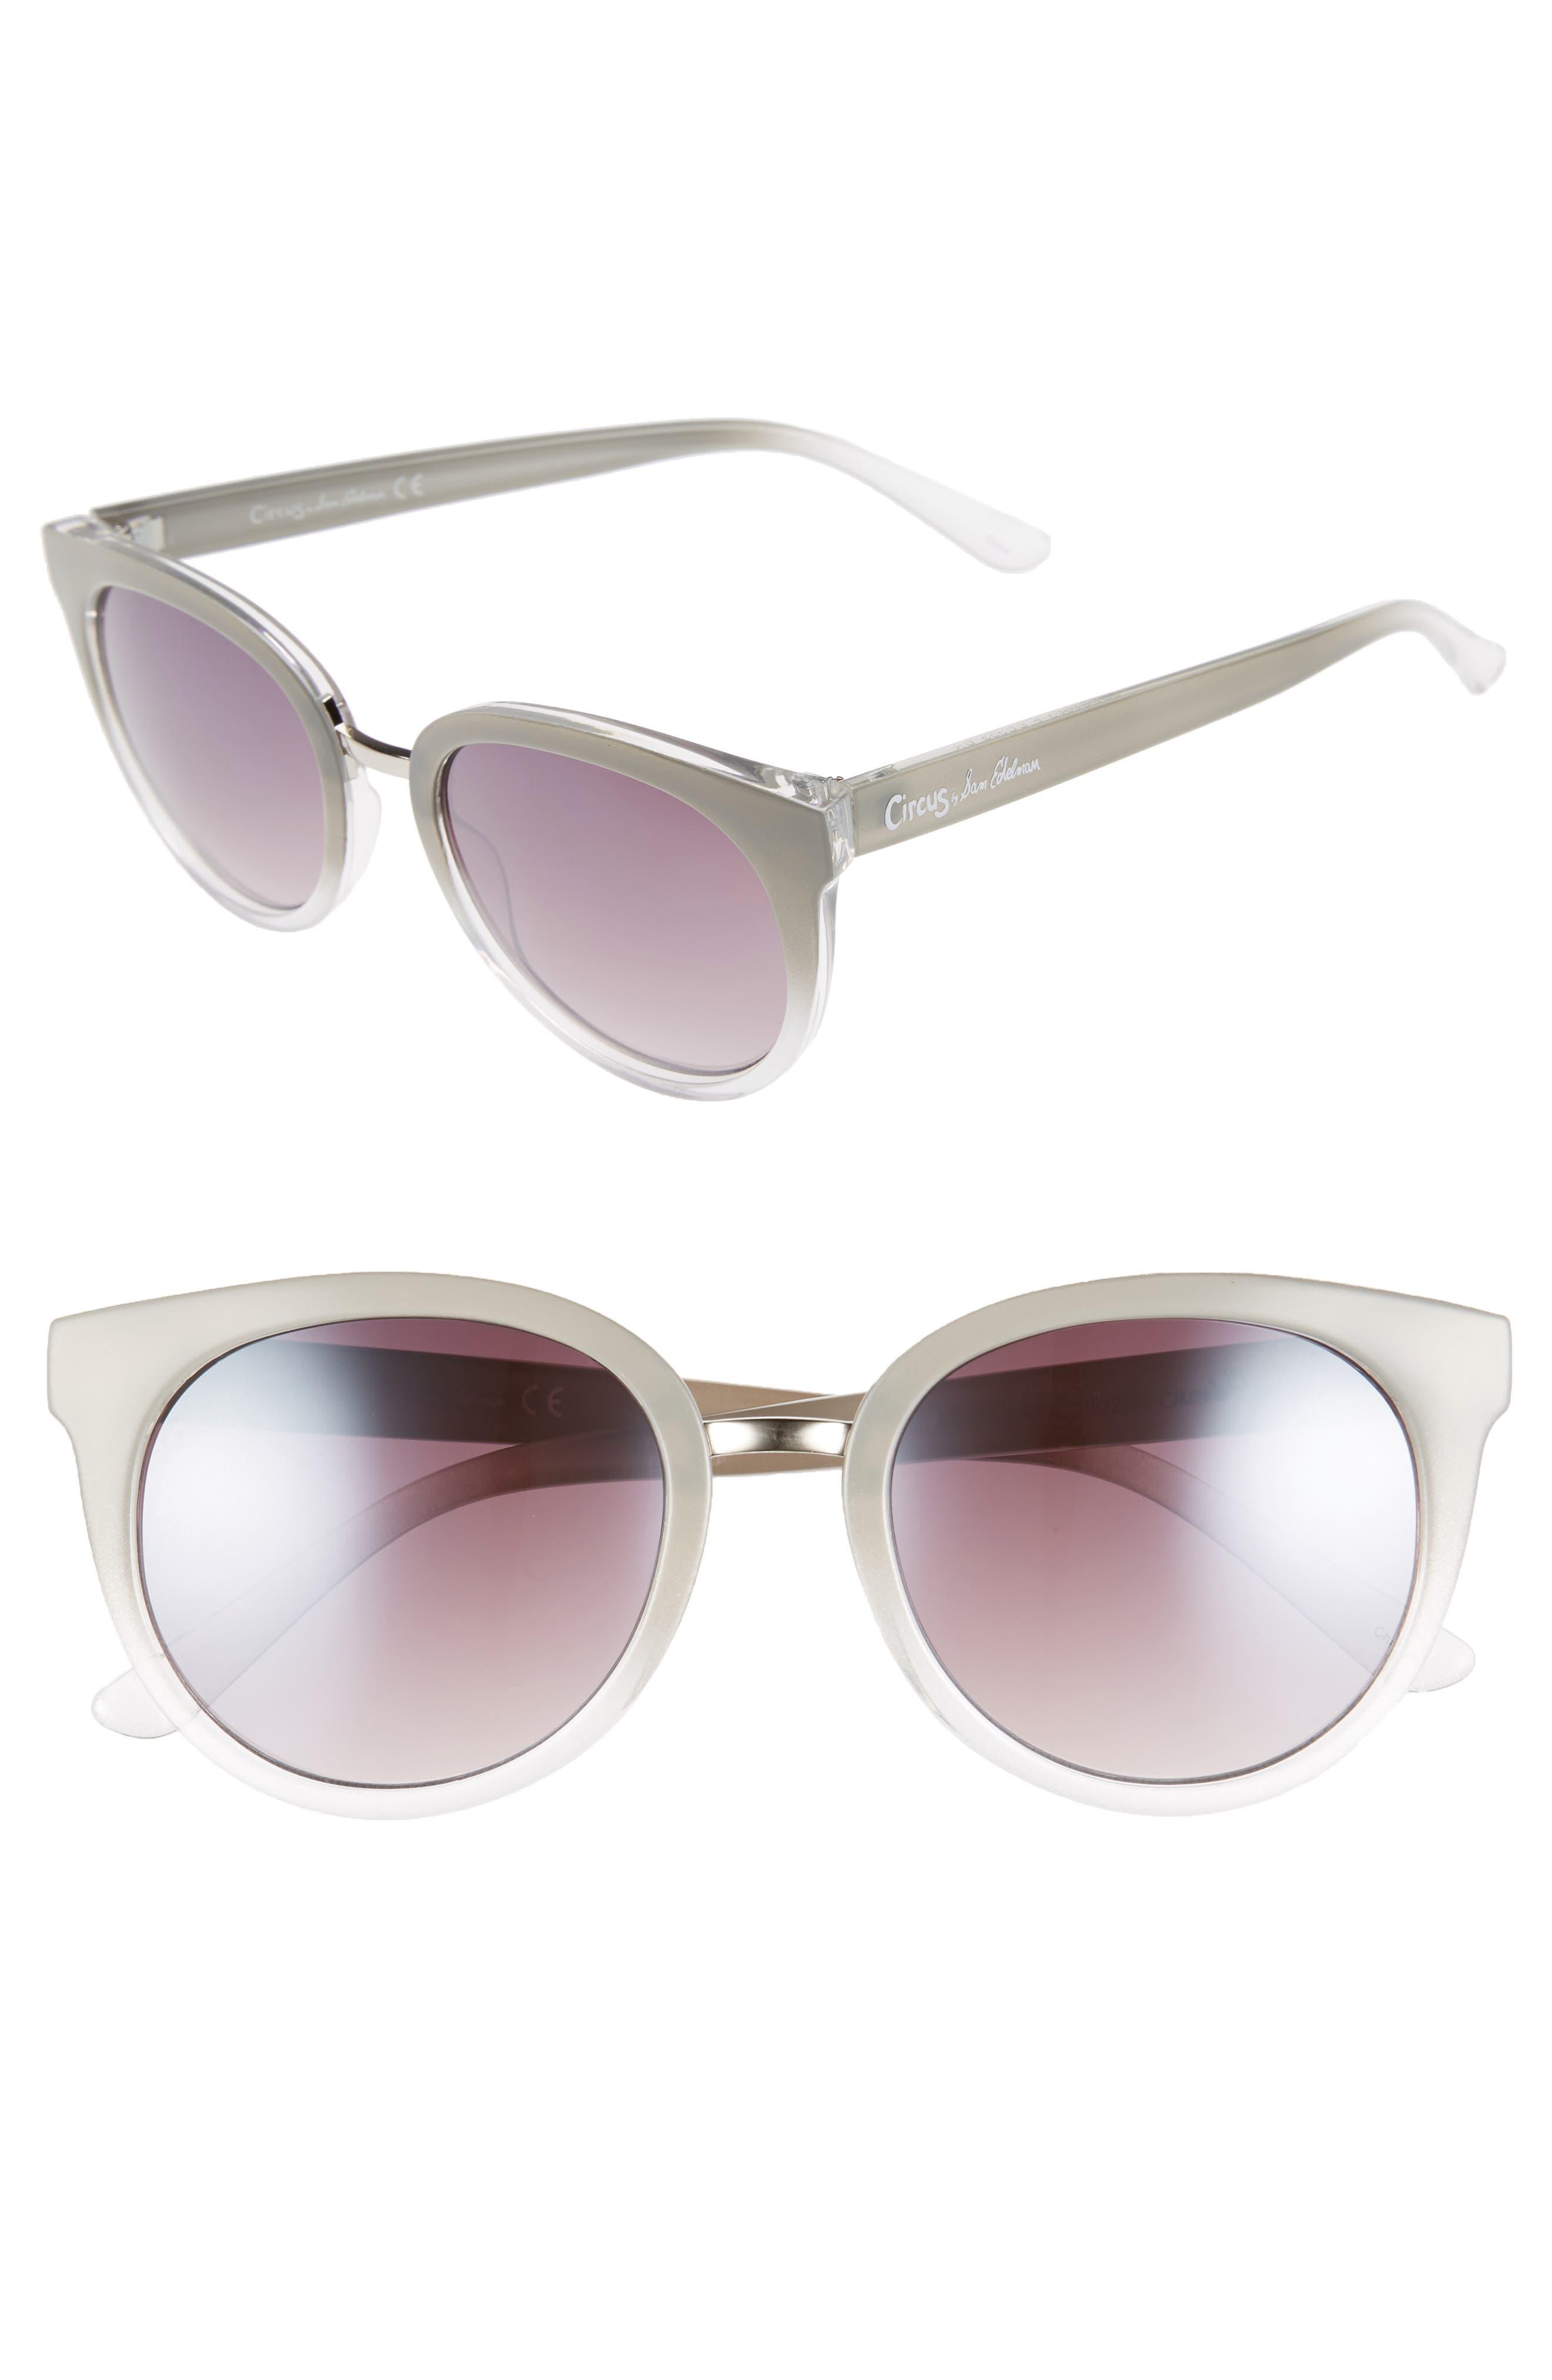 Circus by Sam Edelman 51mm Ombré Sunglasses